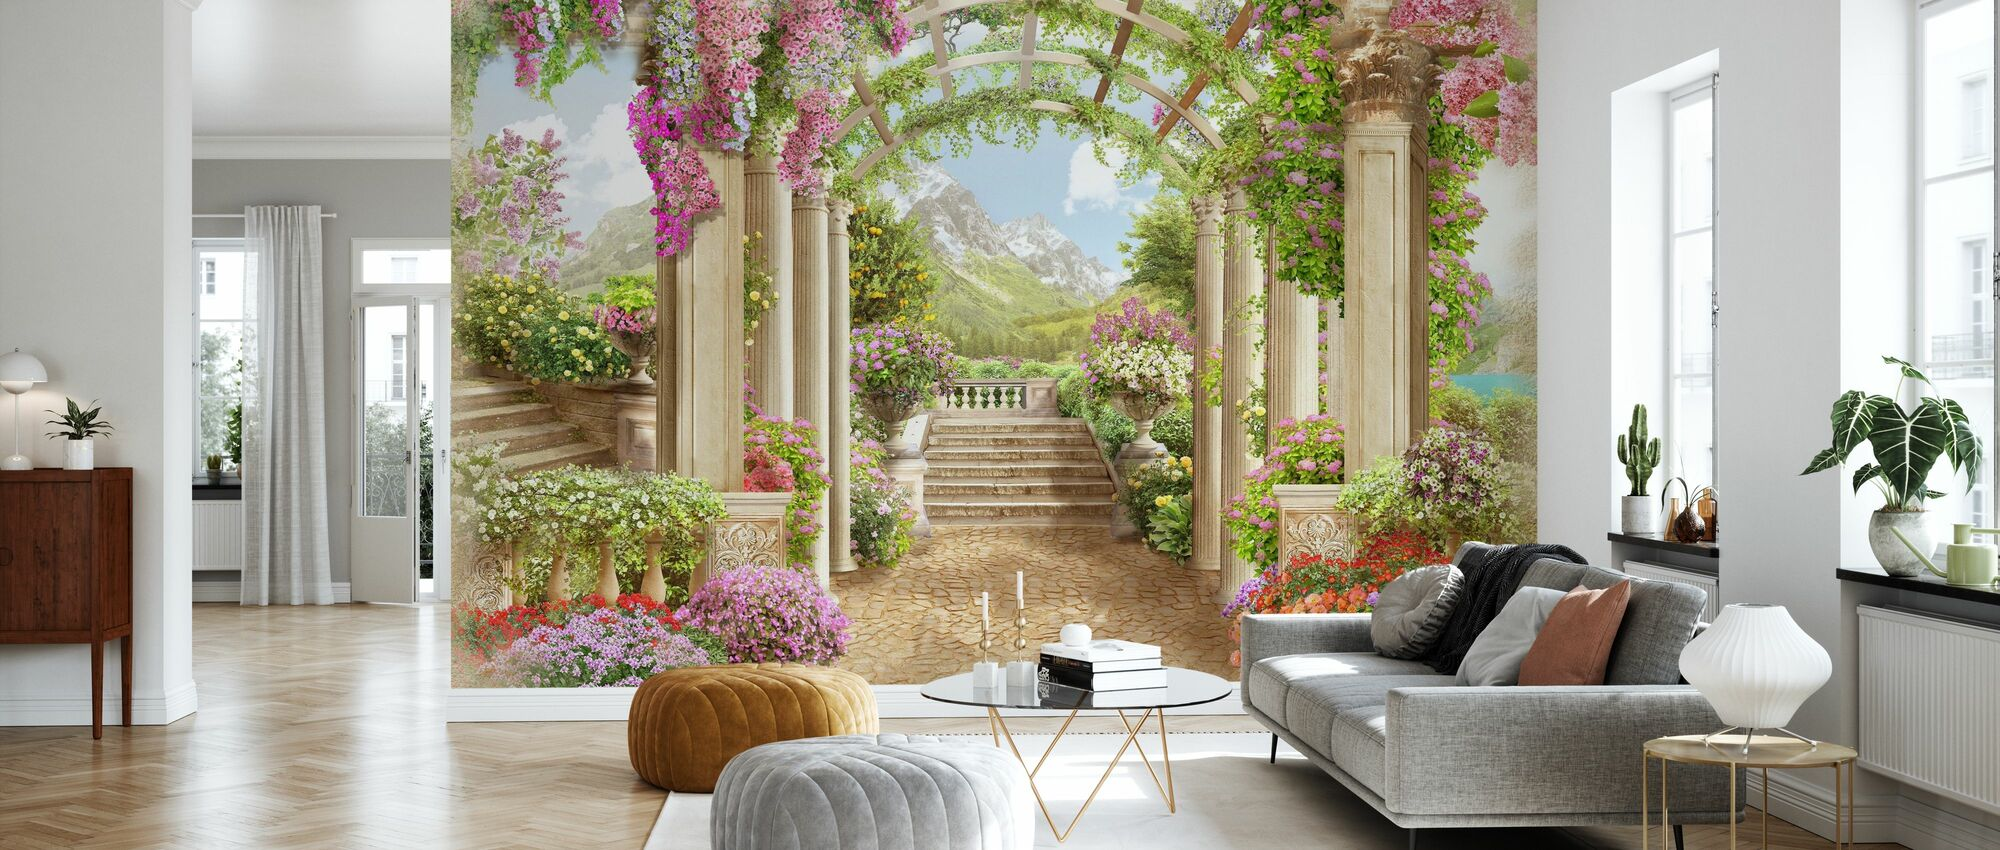 Renaissance Path - Wallpaper - Living Room